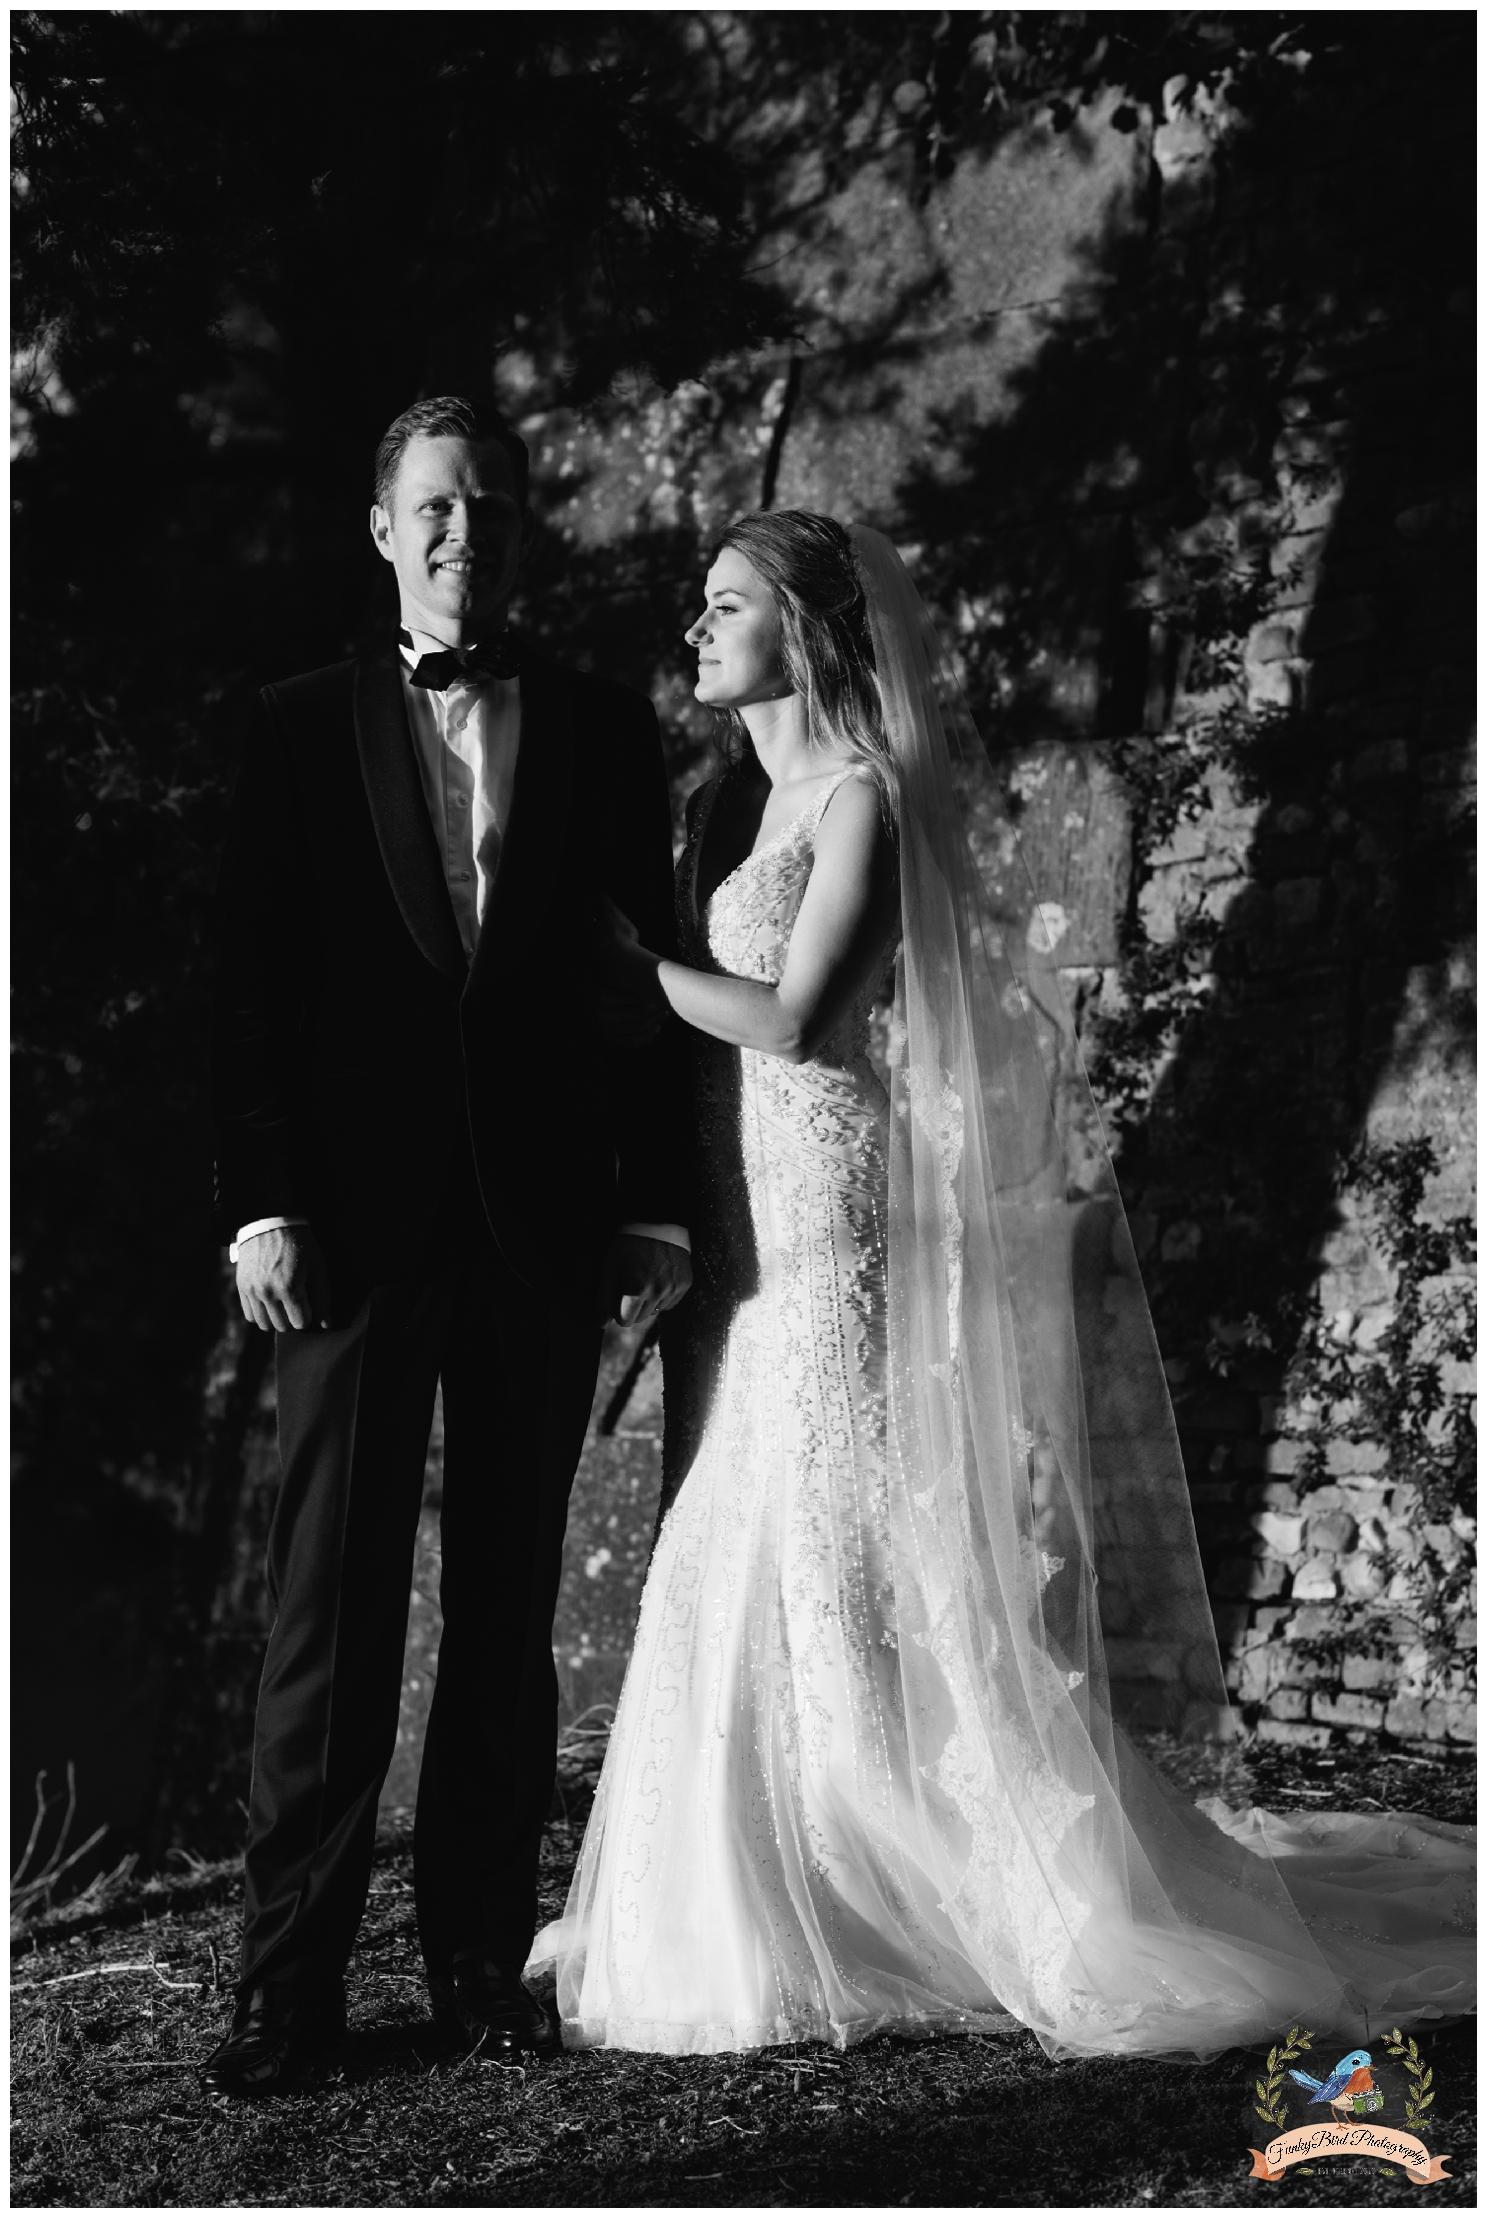 Wedding_Photographer_Tuscany_Italy_0071.jpg